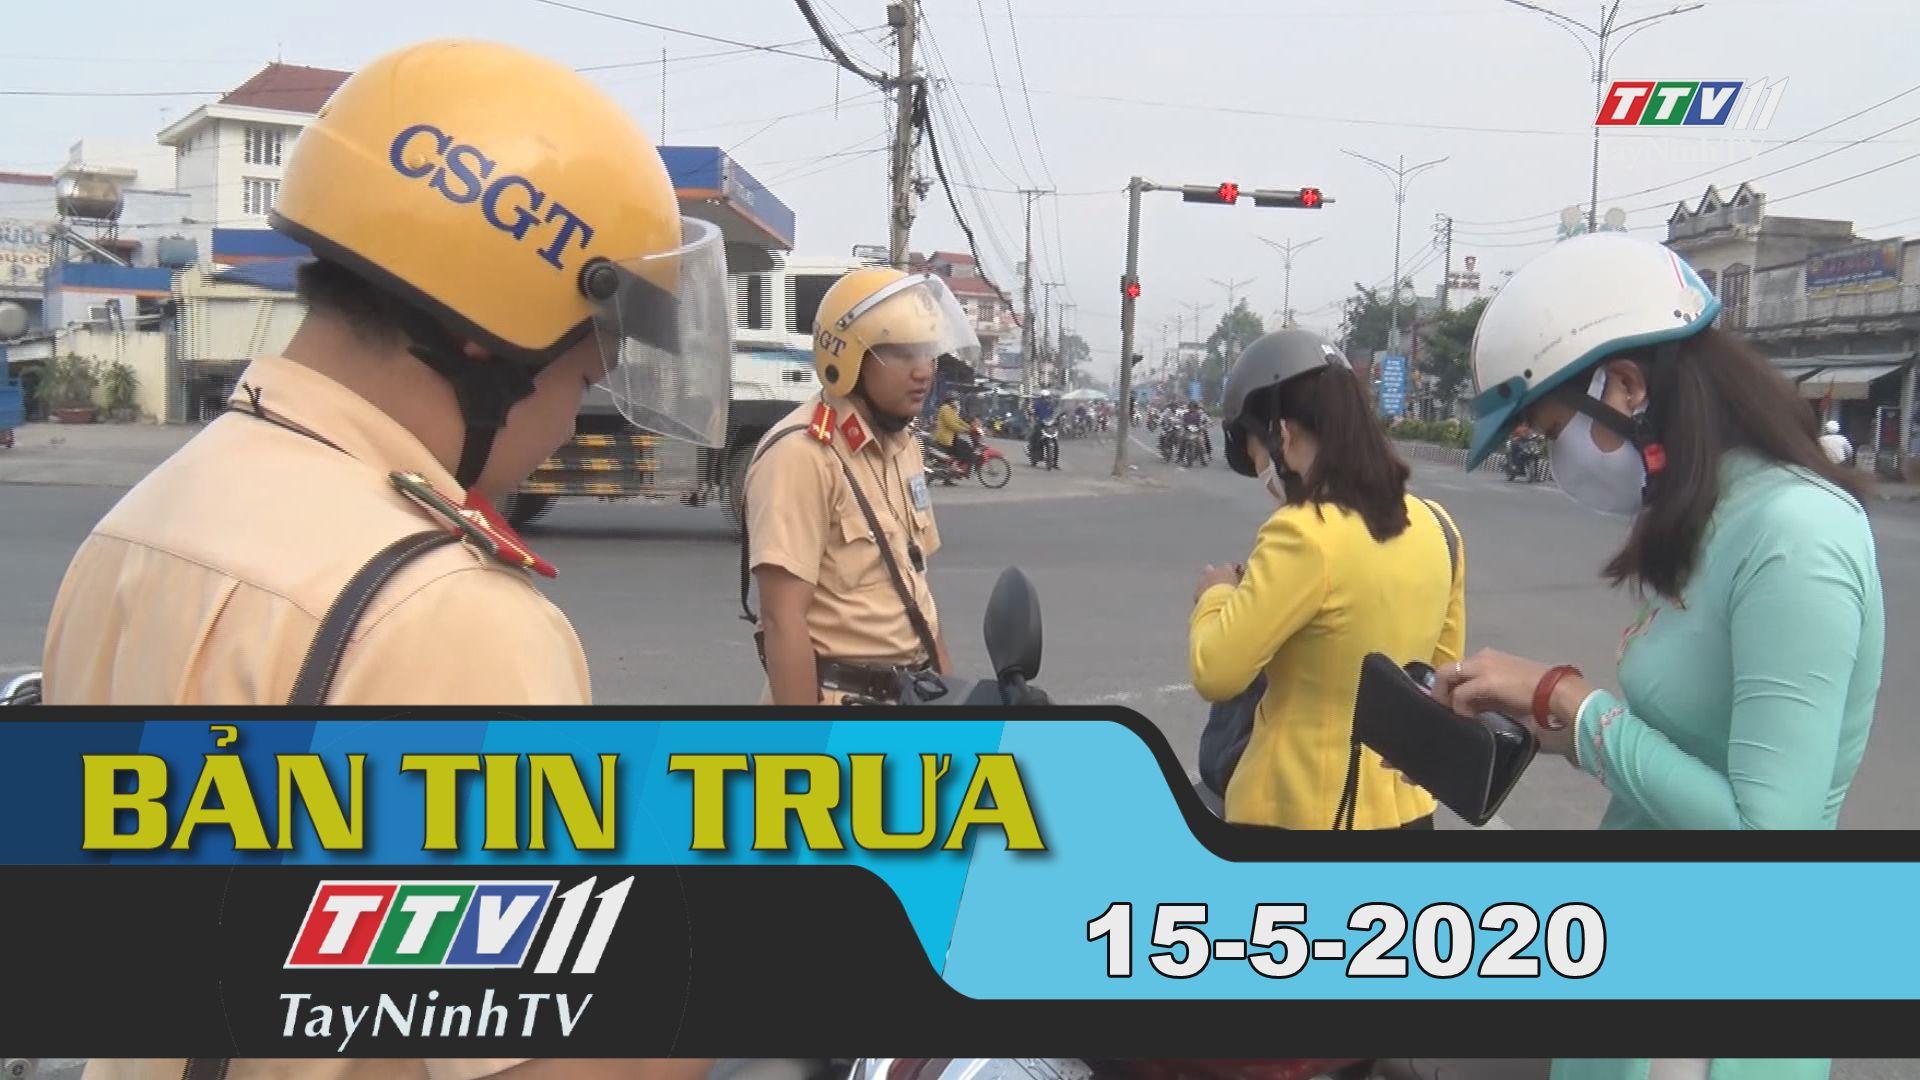 Bản tin trưa 15-5-2020 | Tin tức hôm nay | TayNinhTV